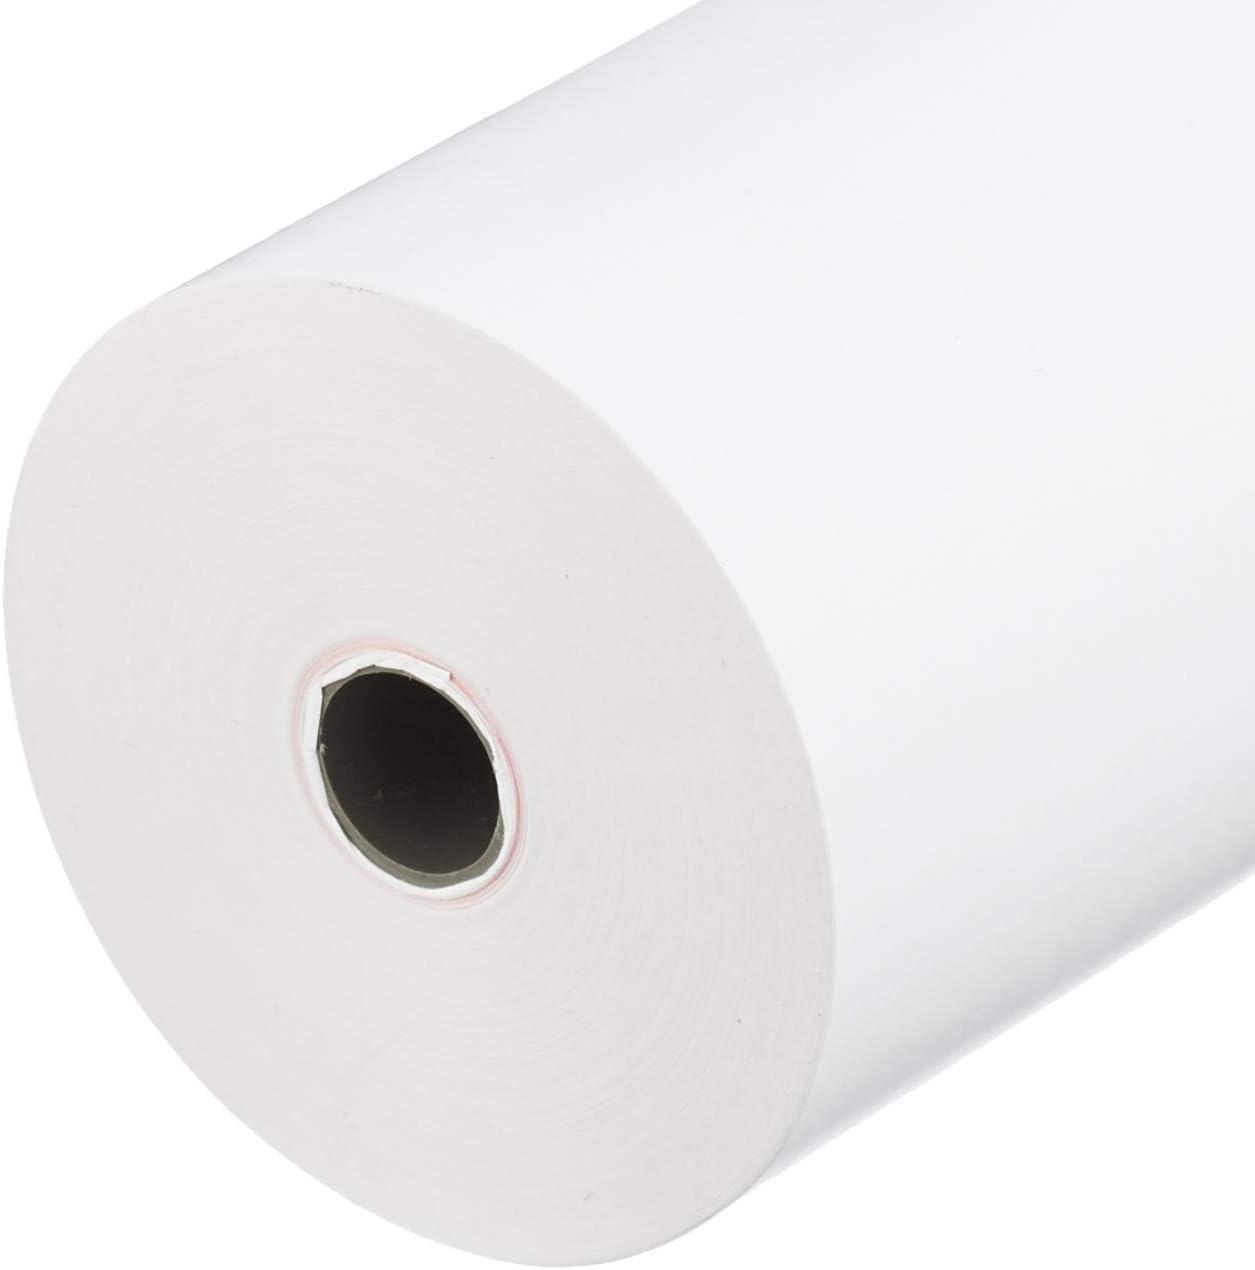 36 mm; /Ø manicotto HeiPOS rotoli di carta termica larghezza 40 m 57x30x12-10 m 25 pezzi 57 mm; /Ø rotolo 12 mm; lunghezza